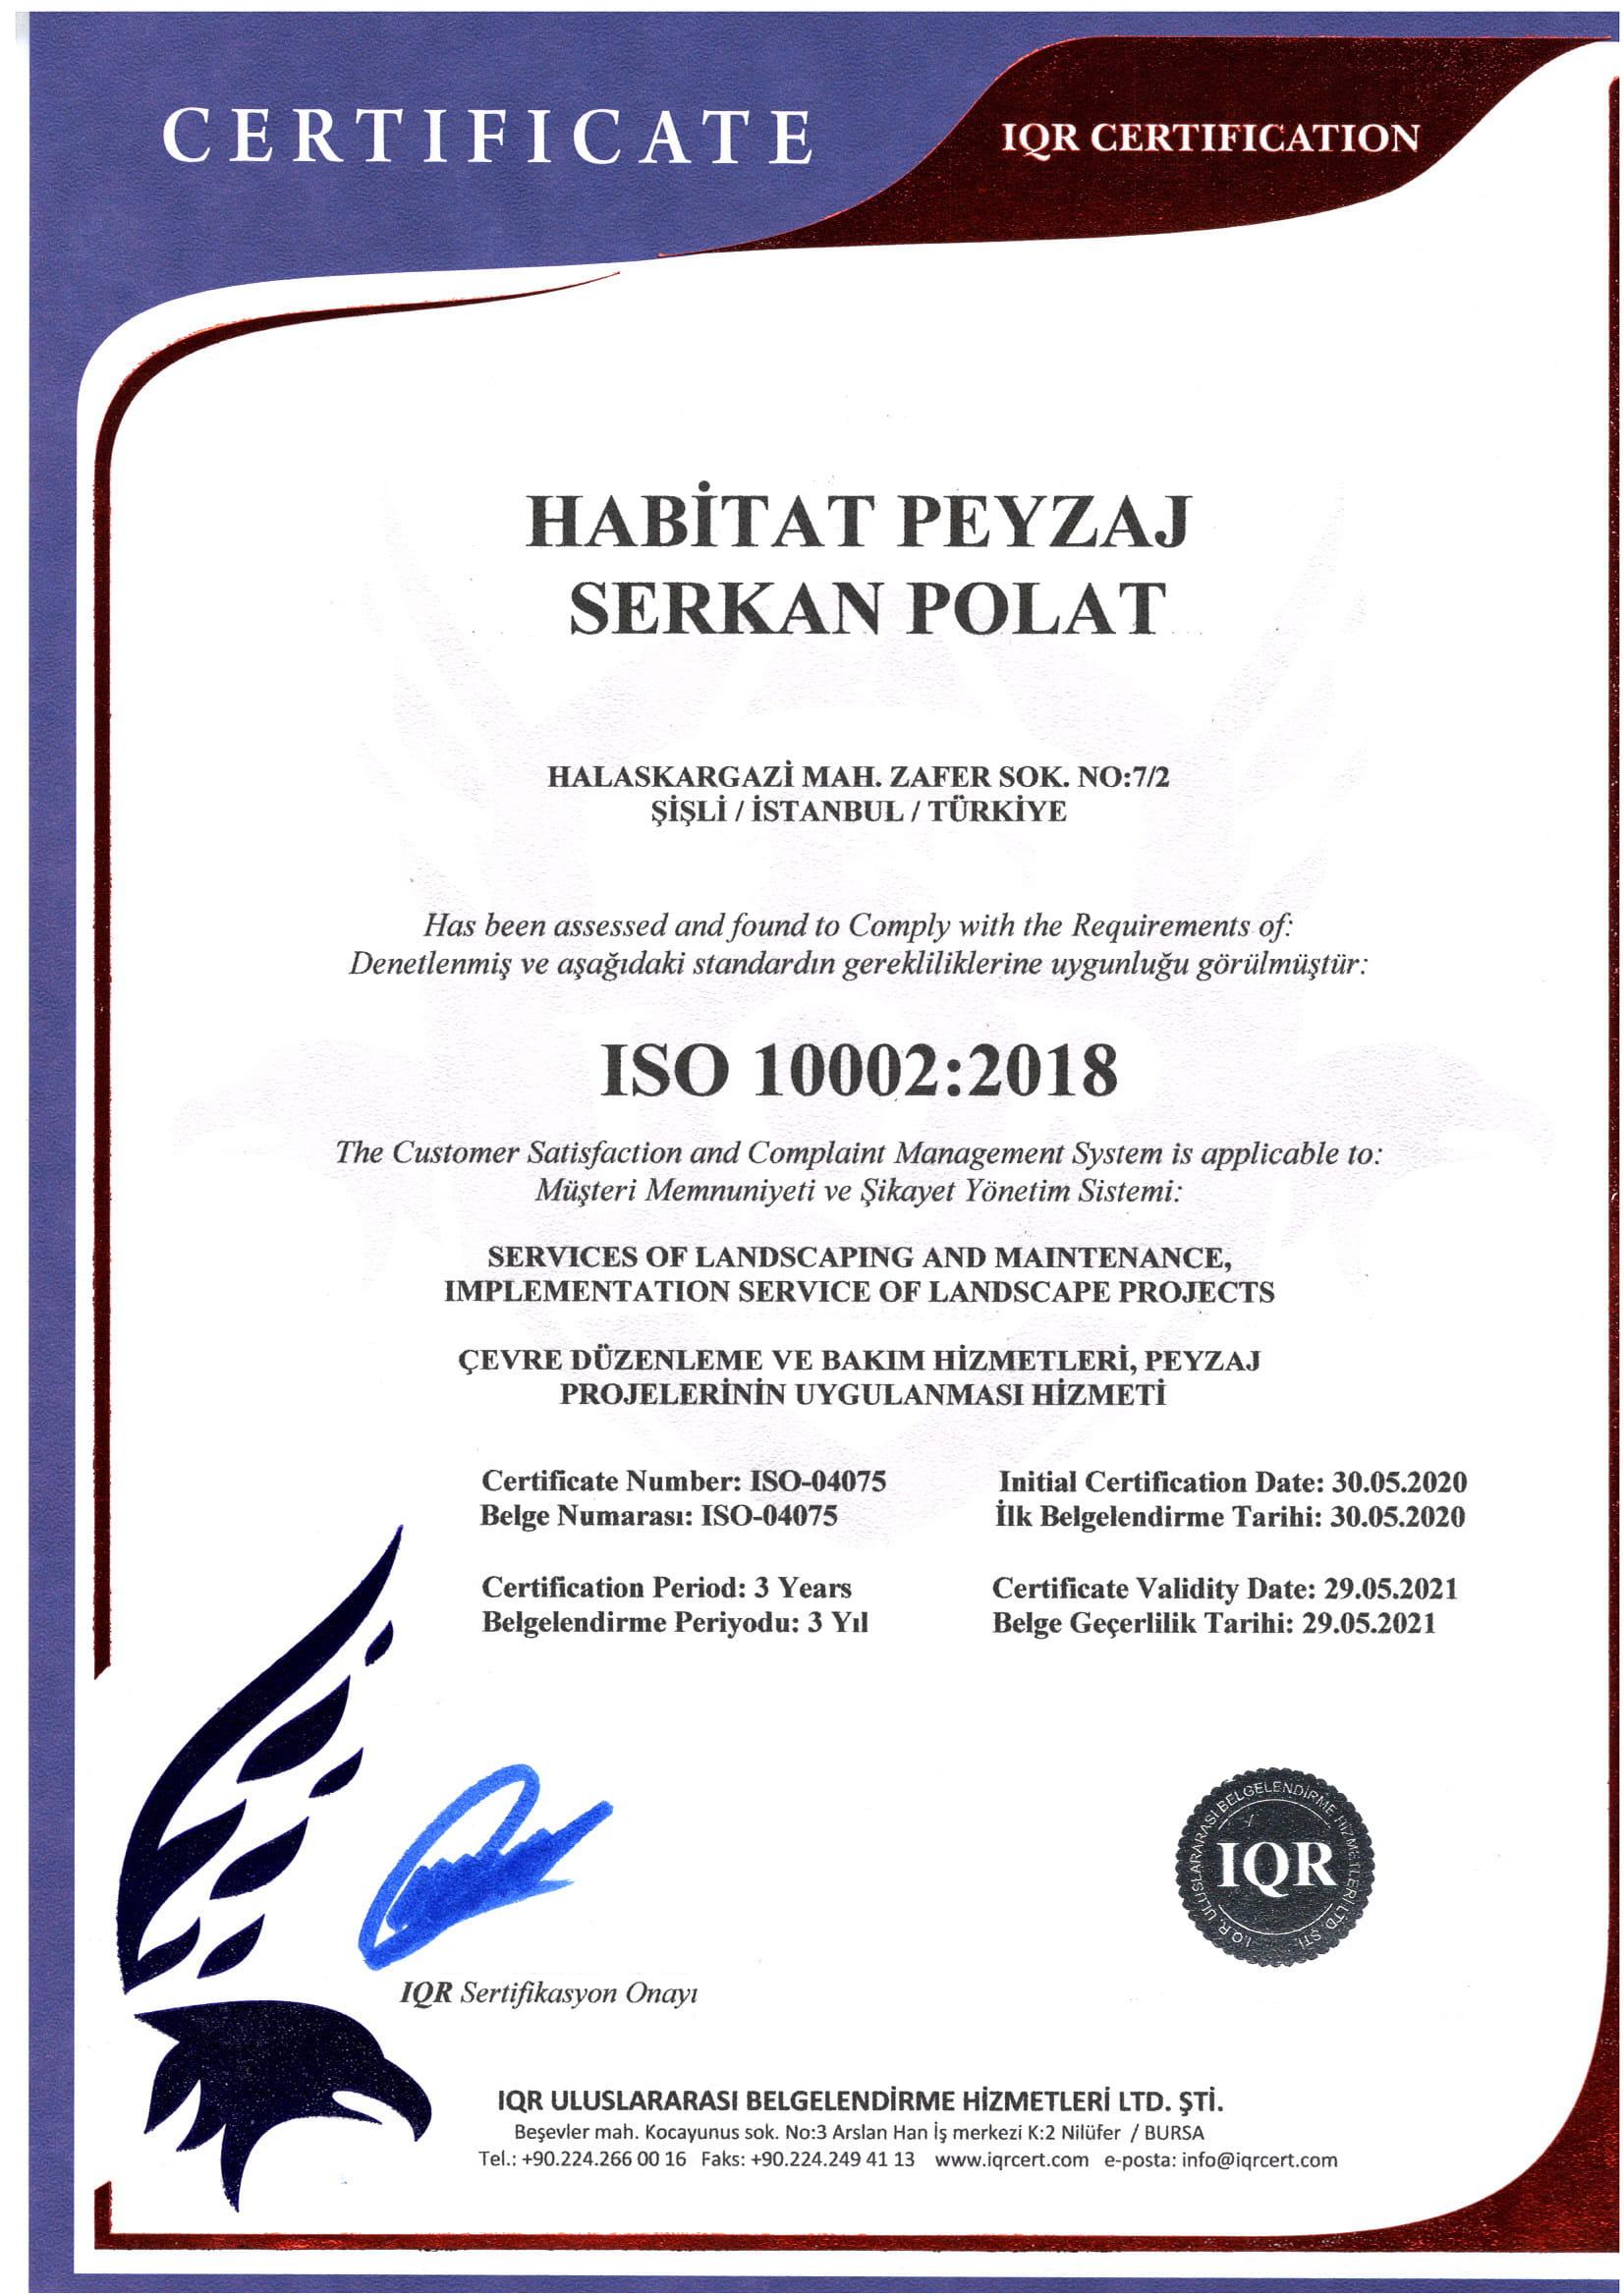 HABİTAT ISO 10002-1